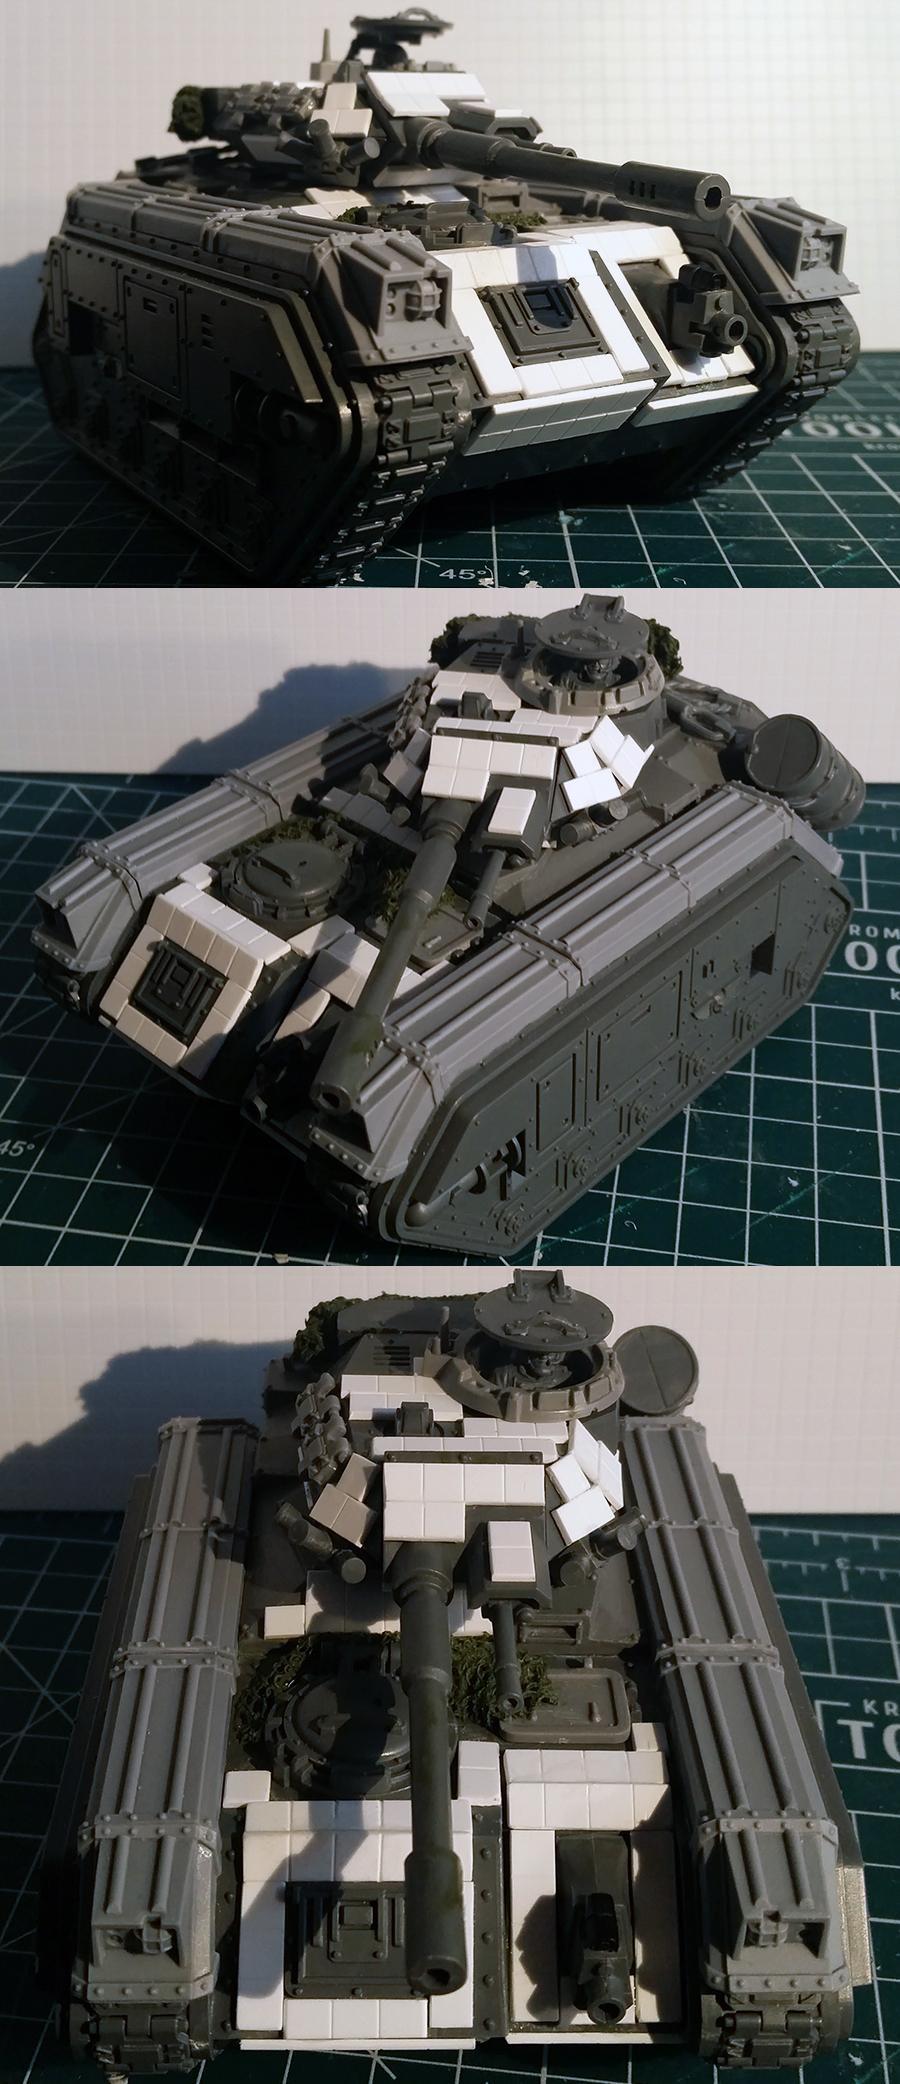 Apc, Astra Militarum, Chimera, Conversion, Cv90, Ifv, Ikv, Imperial Guard, Mechanized, Pansarskytte, Predator Turret, Reactive Armour, Swebat, Swedish, Tank, Veteran